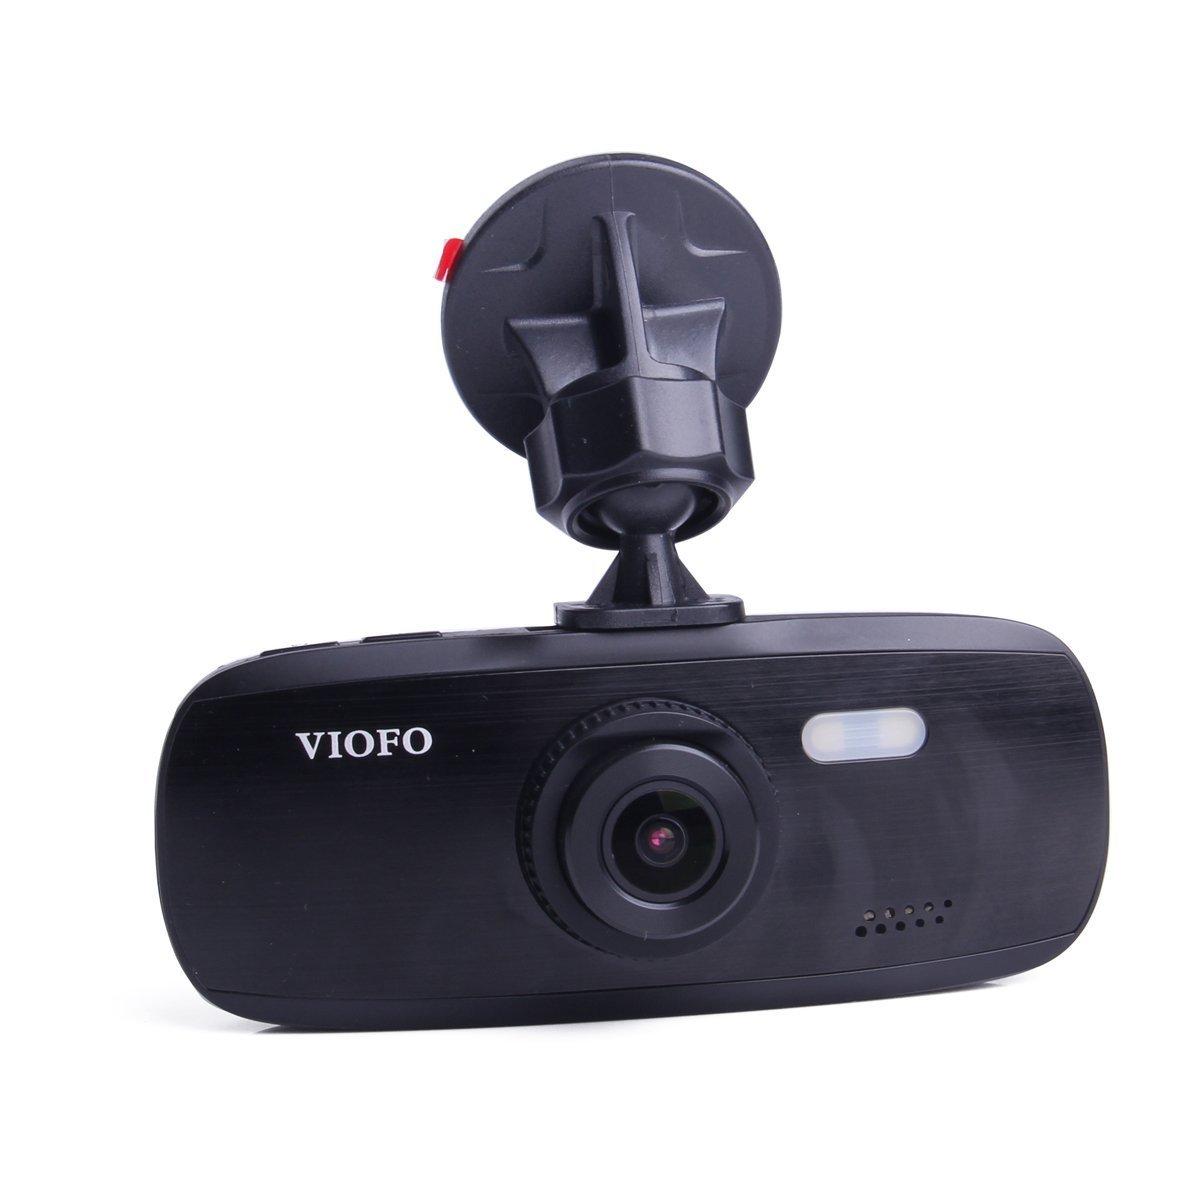 VIOFO G1W-S 2017 NT96650 + Sony IMX323 Car Dash Camera | Full 1080P HD Video & Audio Recording Car DVR Camera Recorder | G-Sensor Capabilities (New GPS Option)